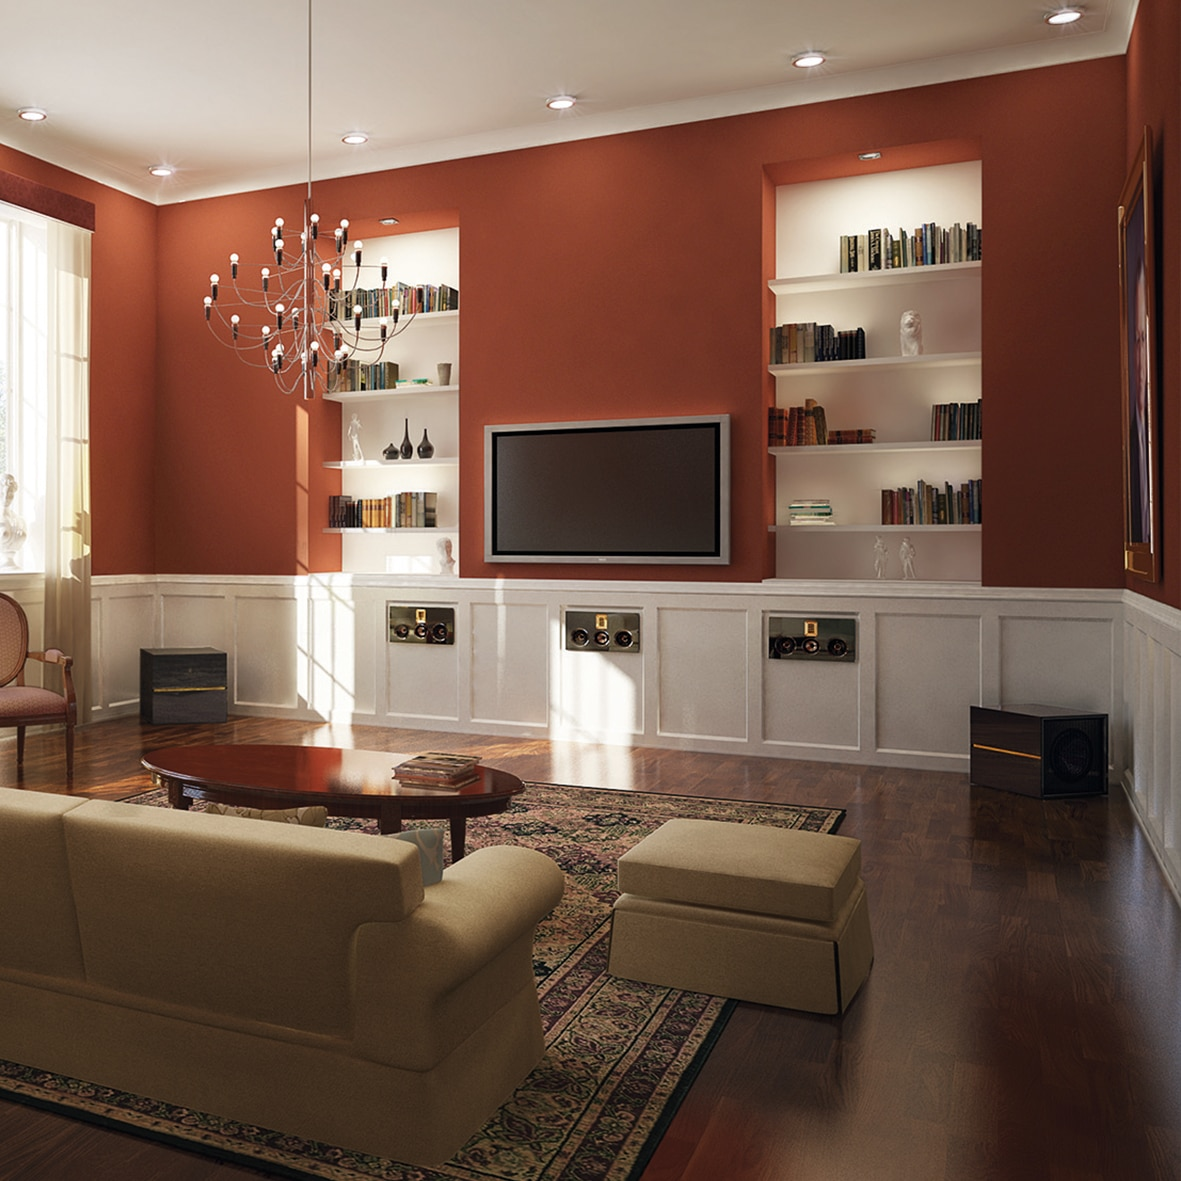 Model M in-wall in living room